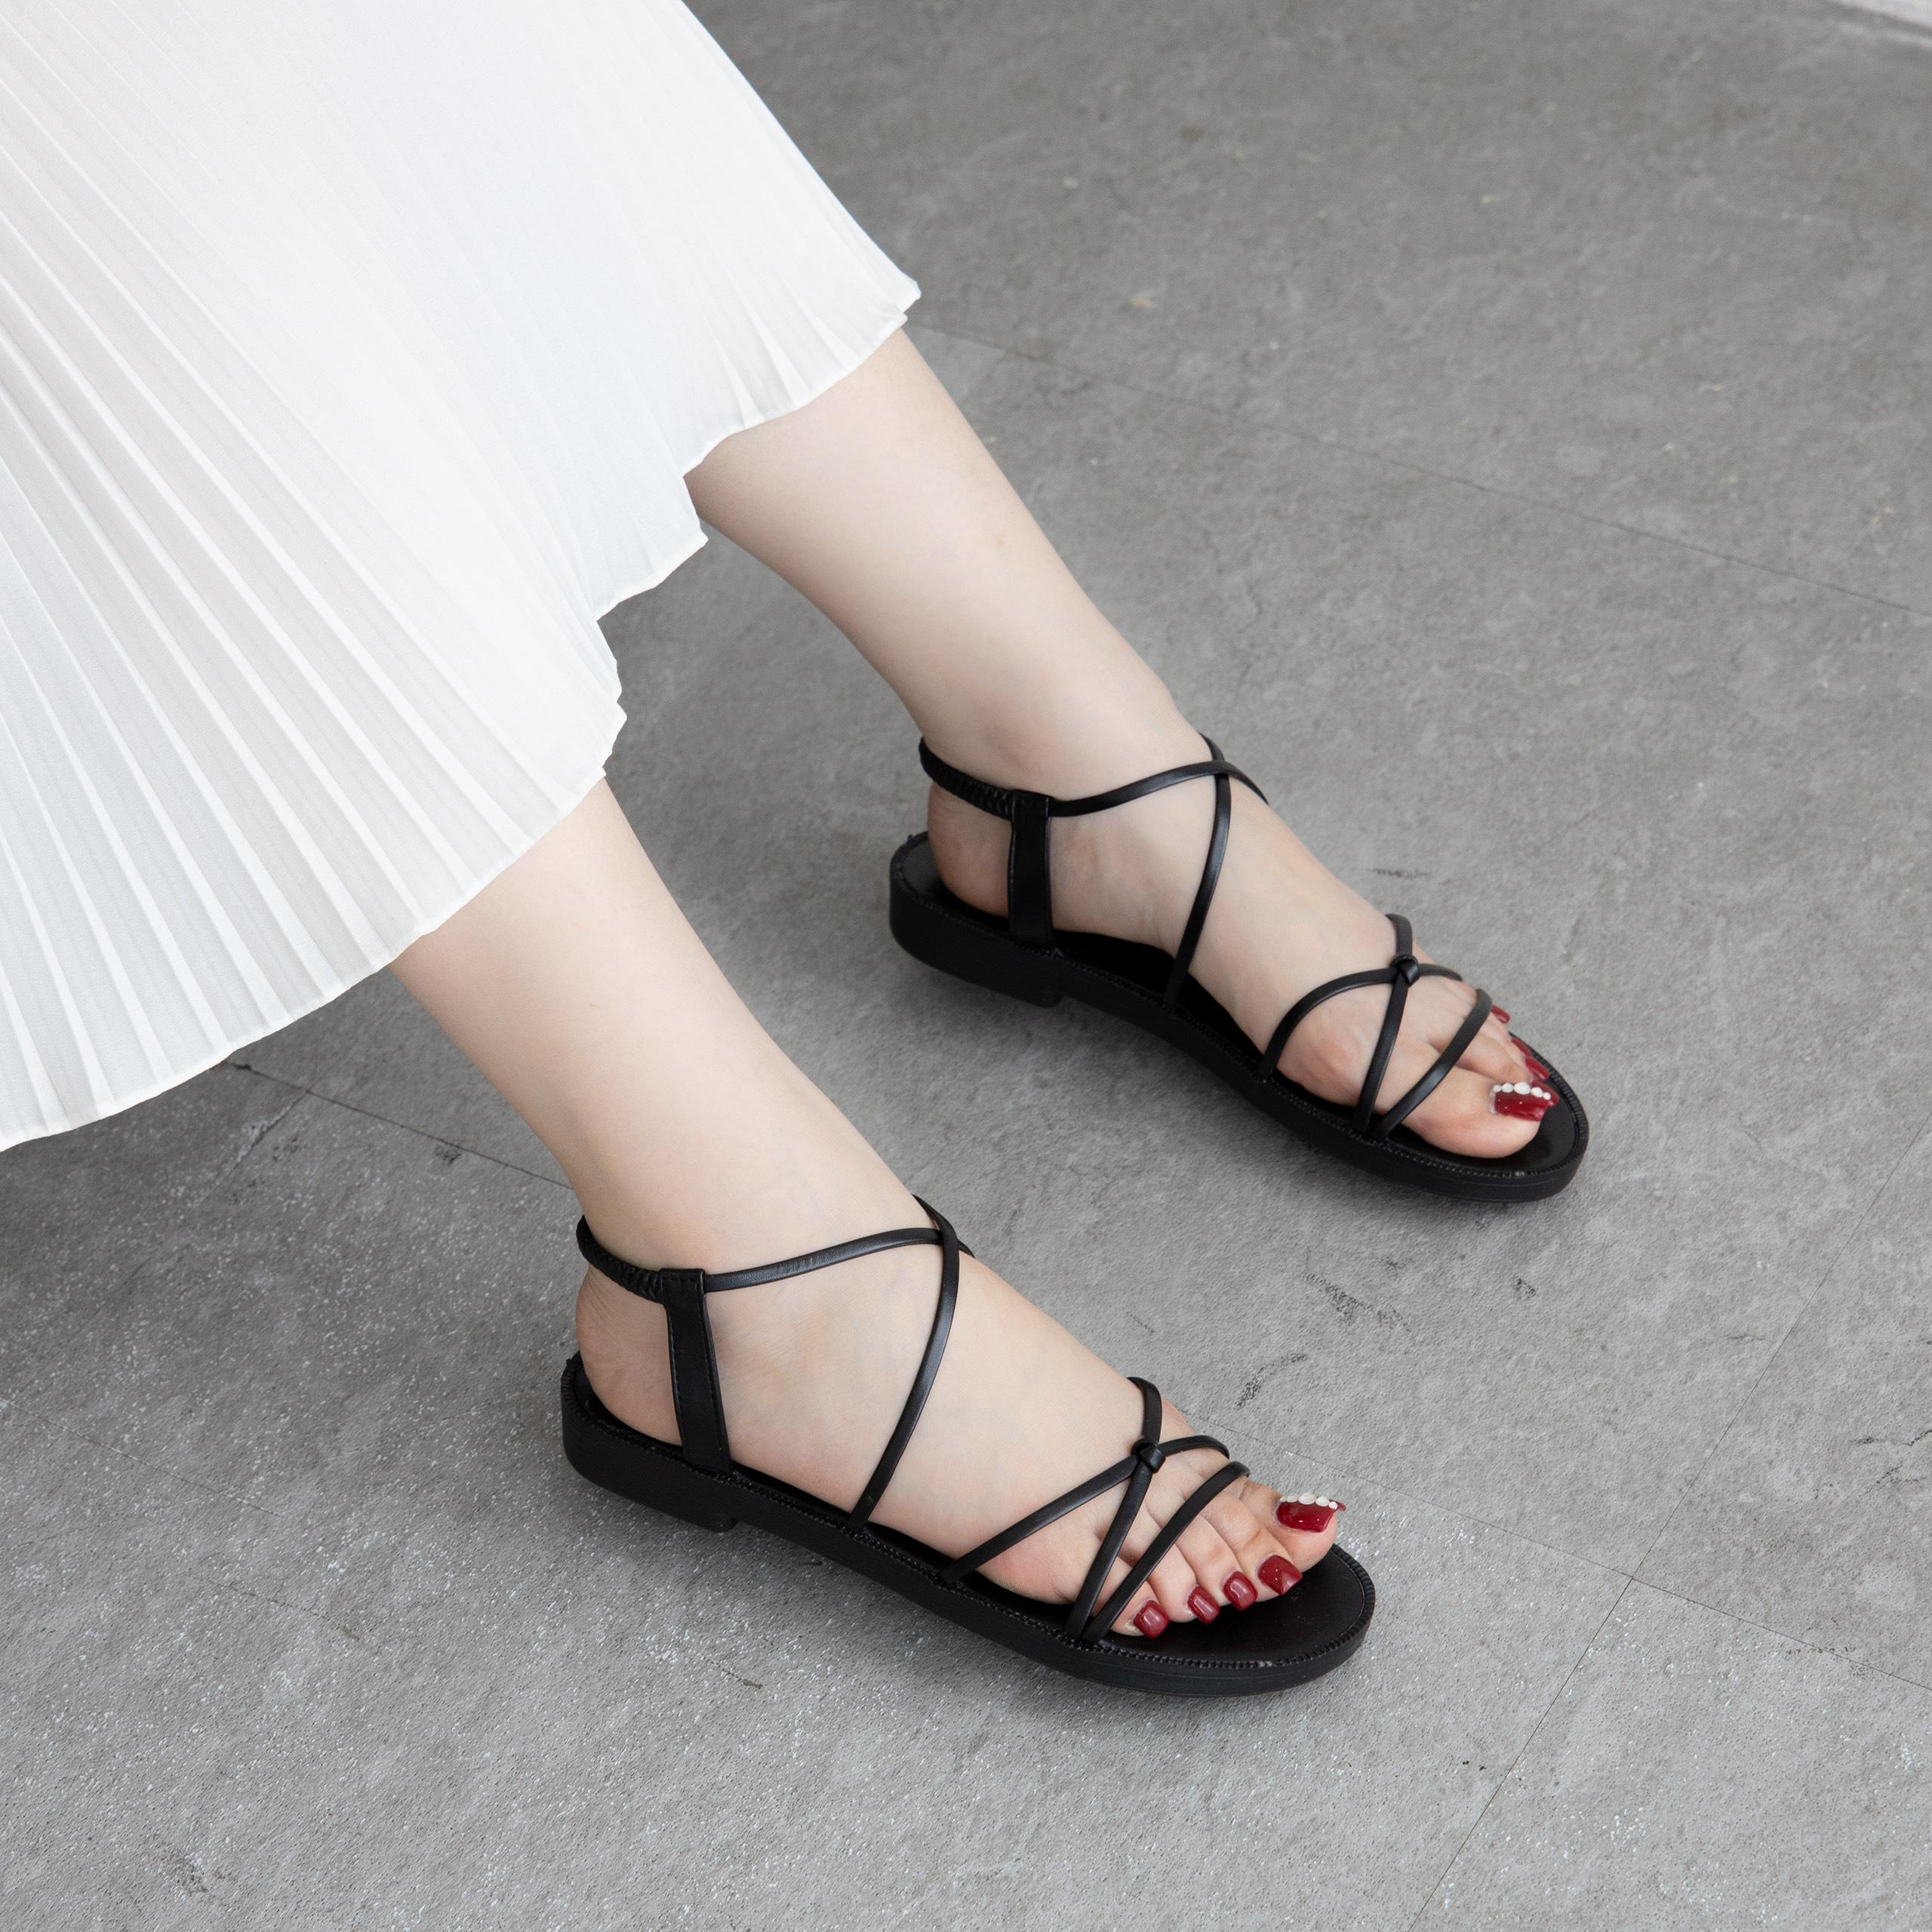 Giày sandal nữ MWC NUSD- 2848